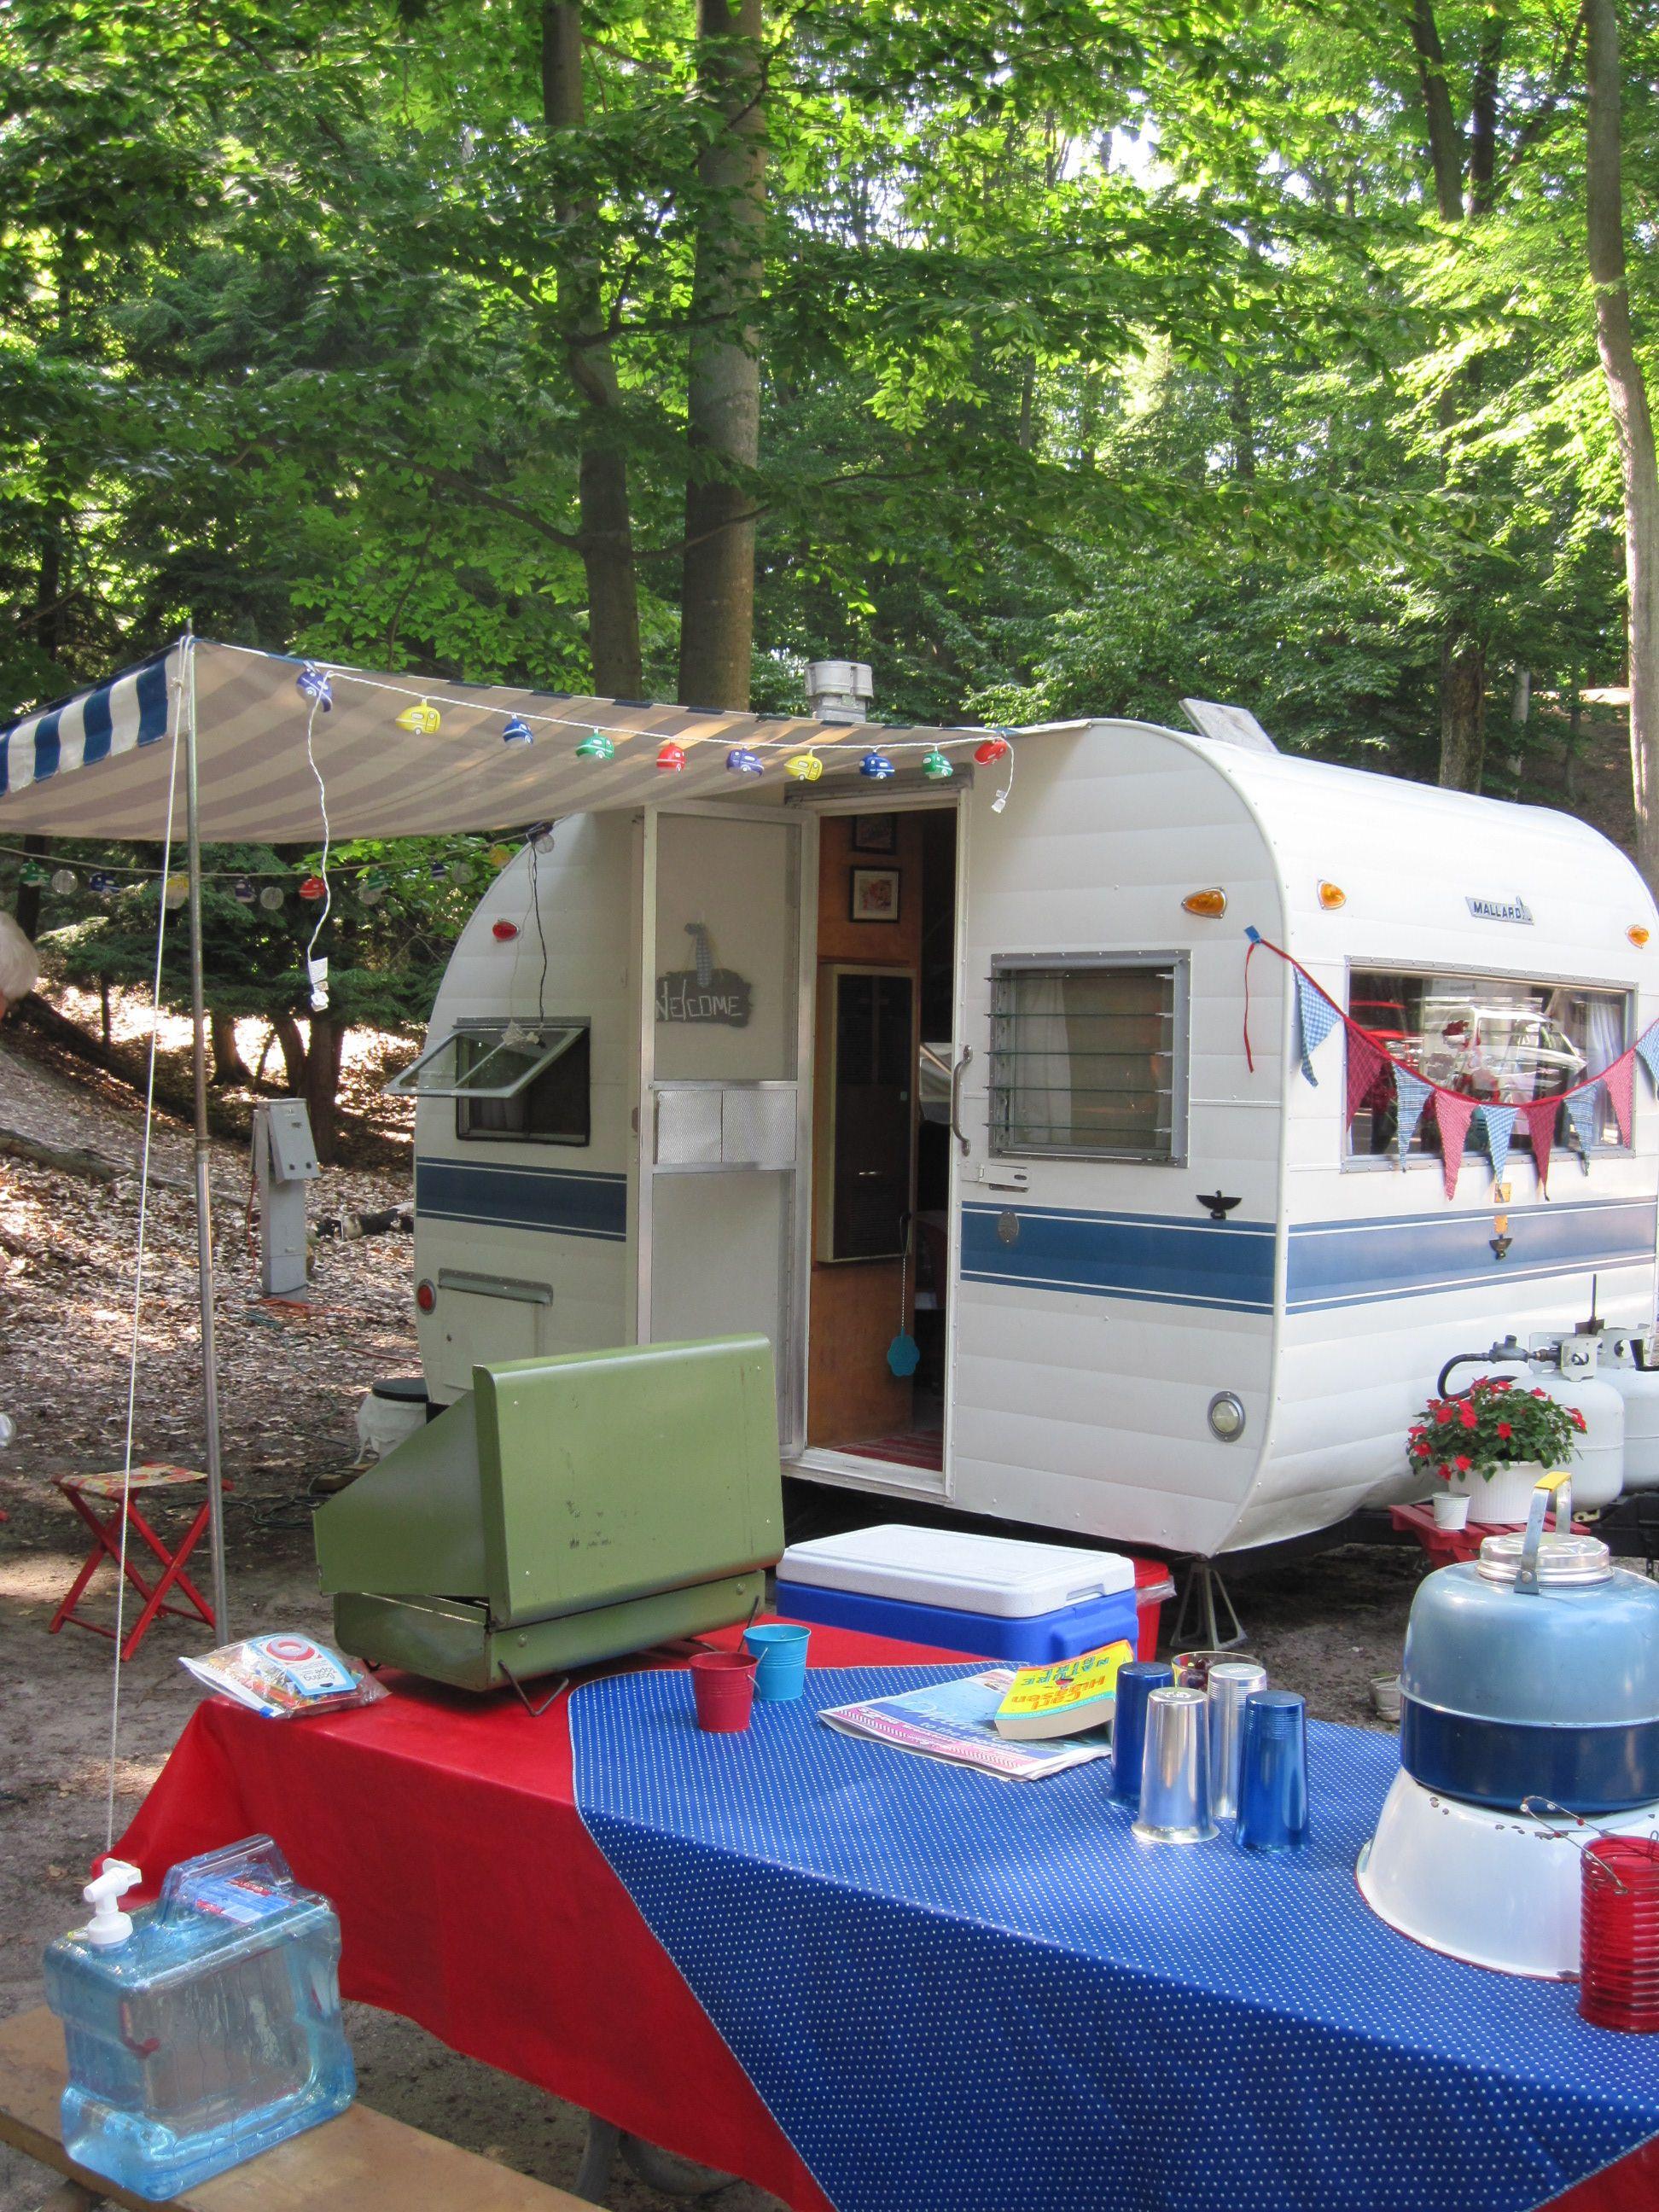 Loyalorderoftheglamper Com Travel Trailer Camping Vintage Camper Vintage Campers Trailers